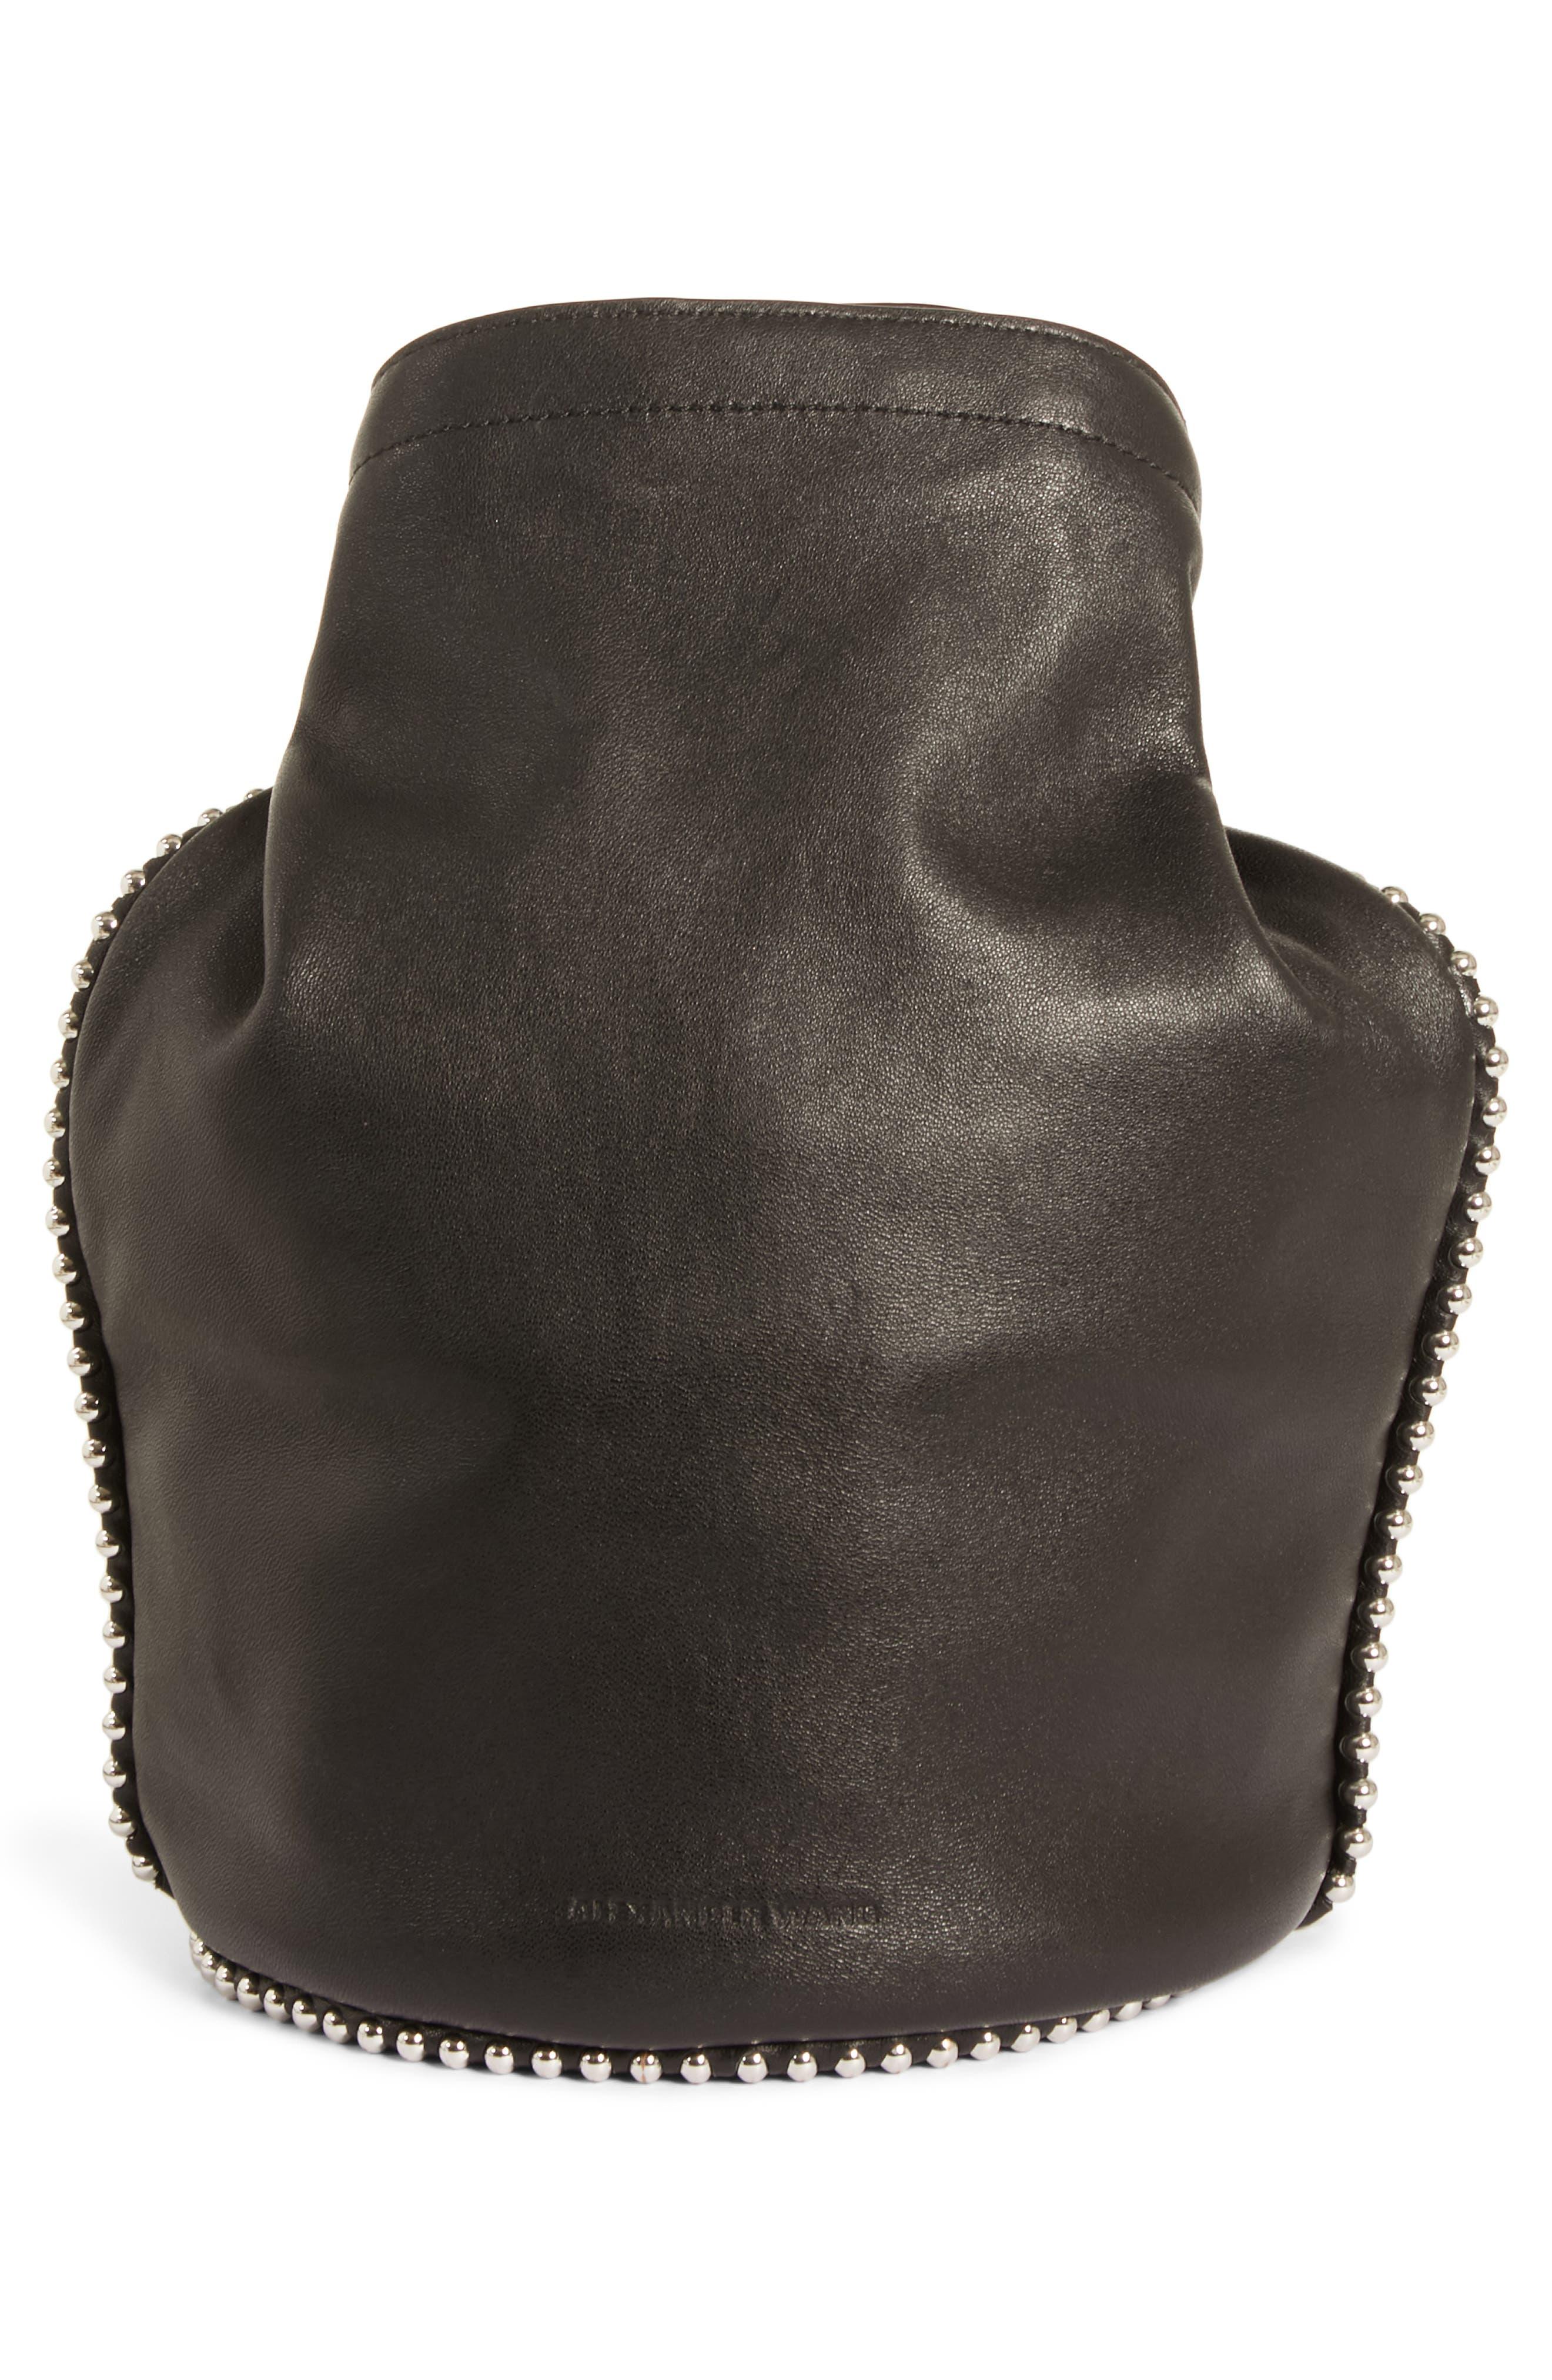 Attica Dry Sack Leather Bucket Bag,                             Alternate thumbnail 4, color,                             BLACK